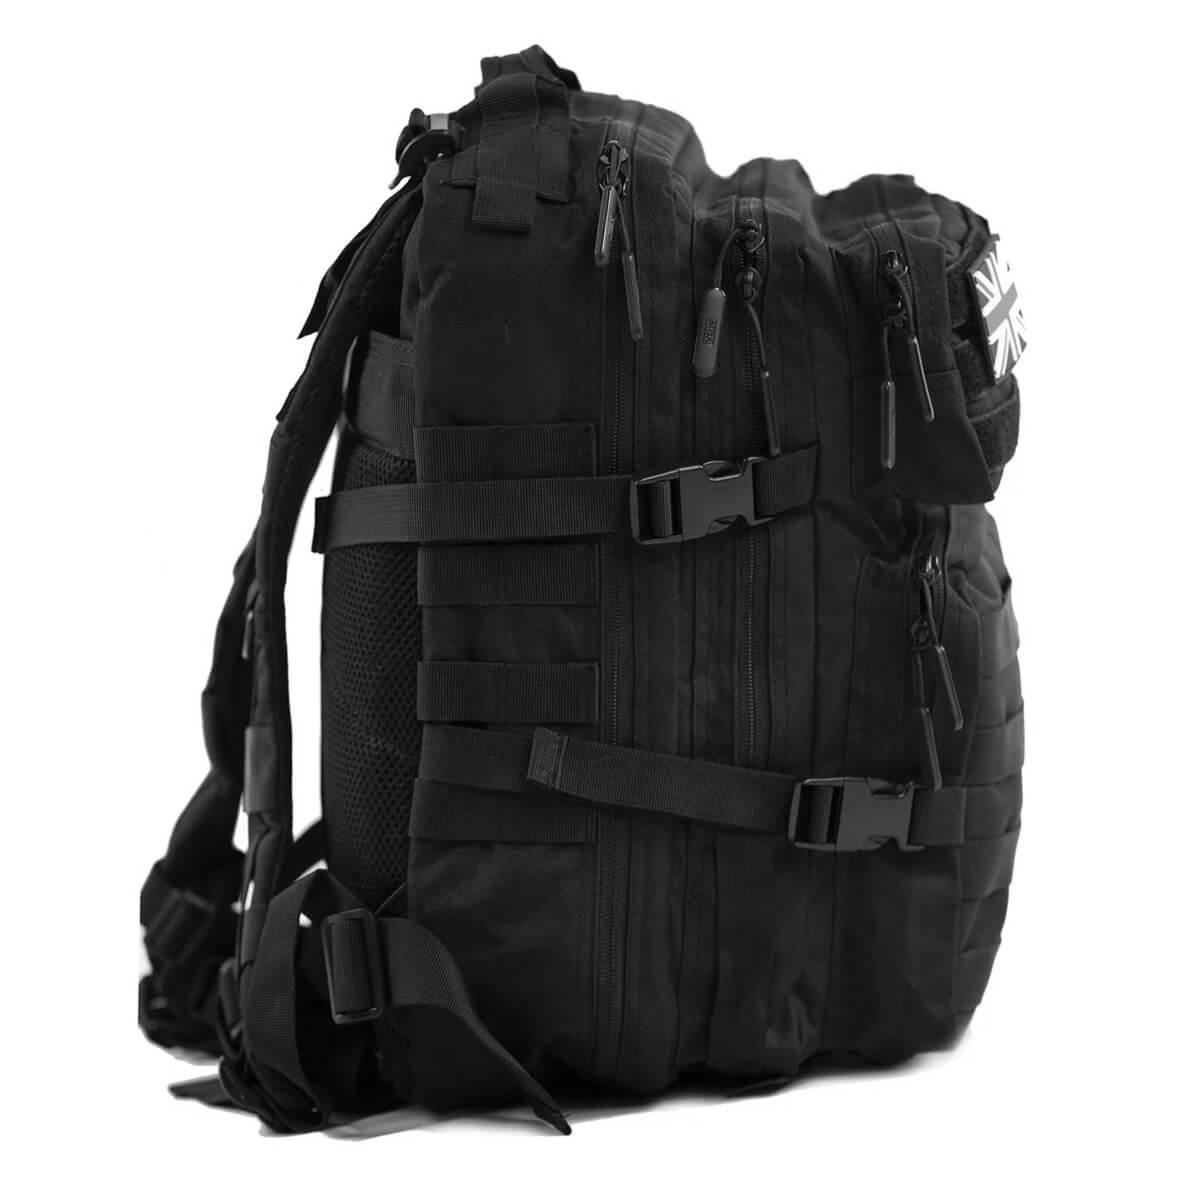 thumbnail 4 - Modern Day Athlete Unisex 2021 MD25 Waterproof Gym Training Backpack Rucksack